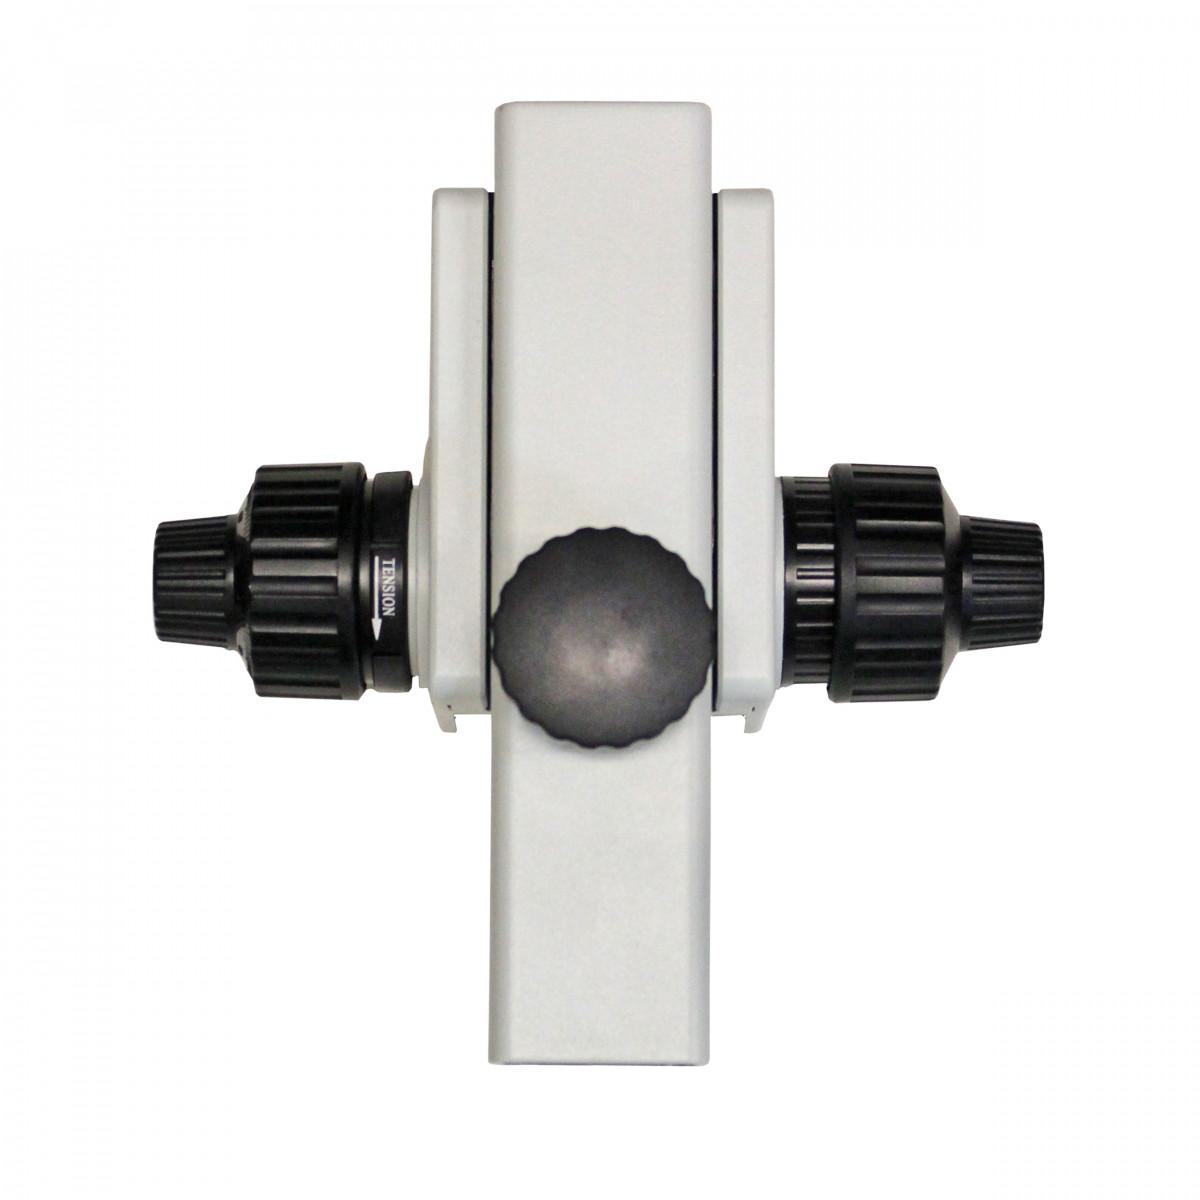 112-14-10-Coaxial Focusing Arm - Z12 Series